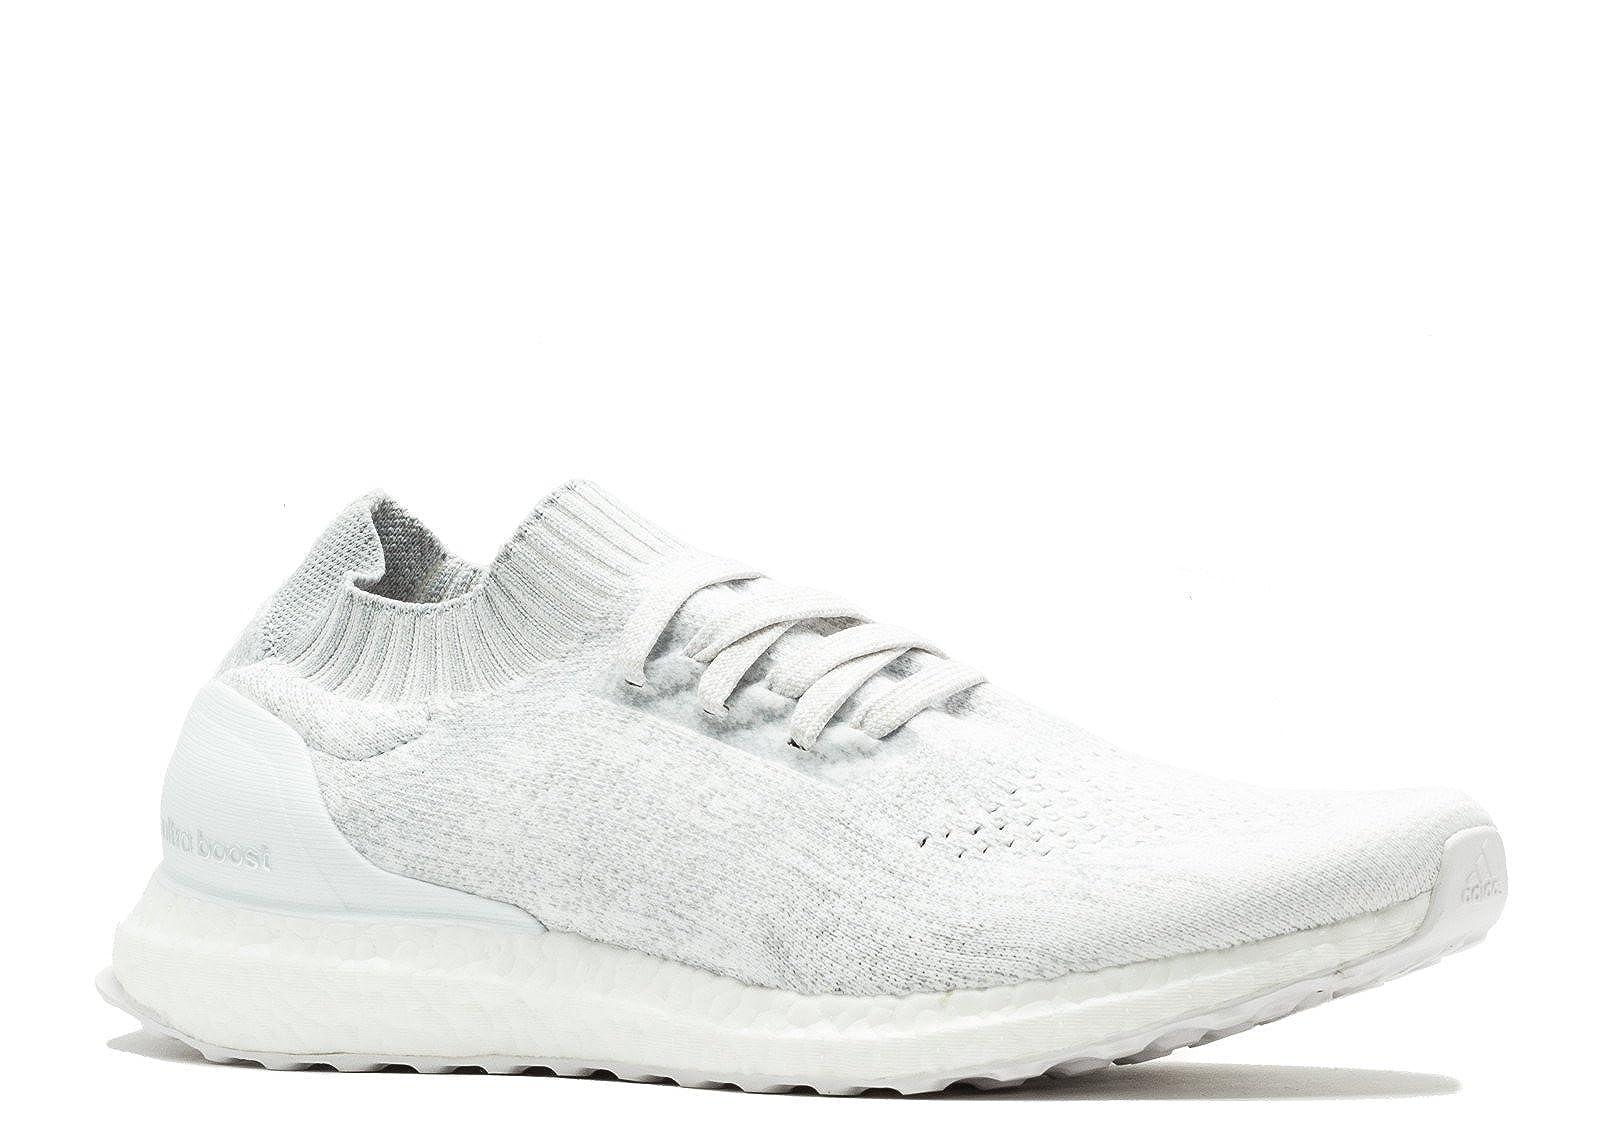 adidas Men's UltraBoost Uncaged, BLACKWHITE, 9 M US